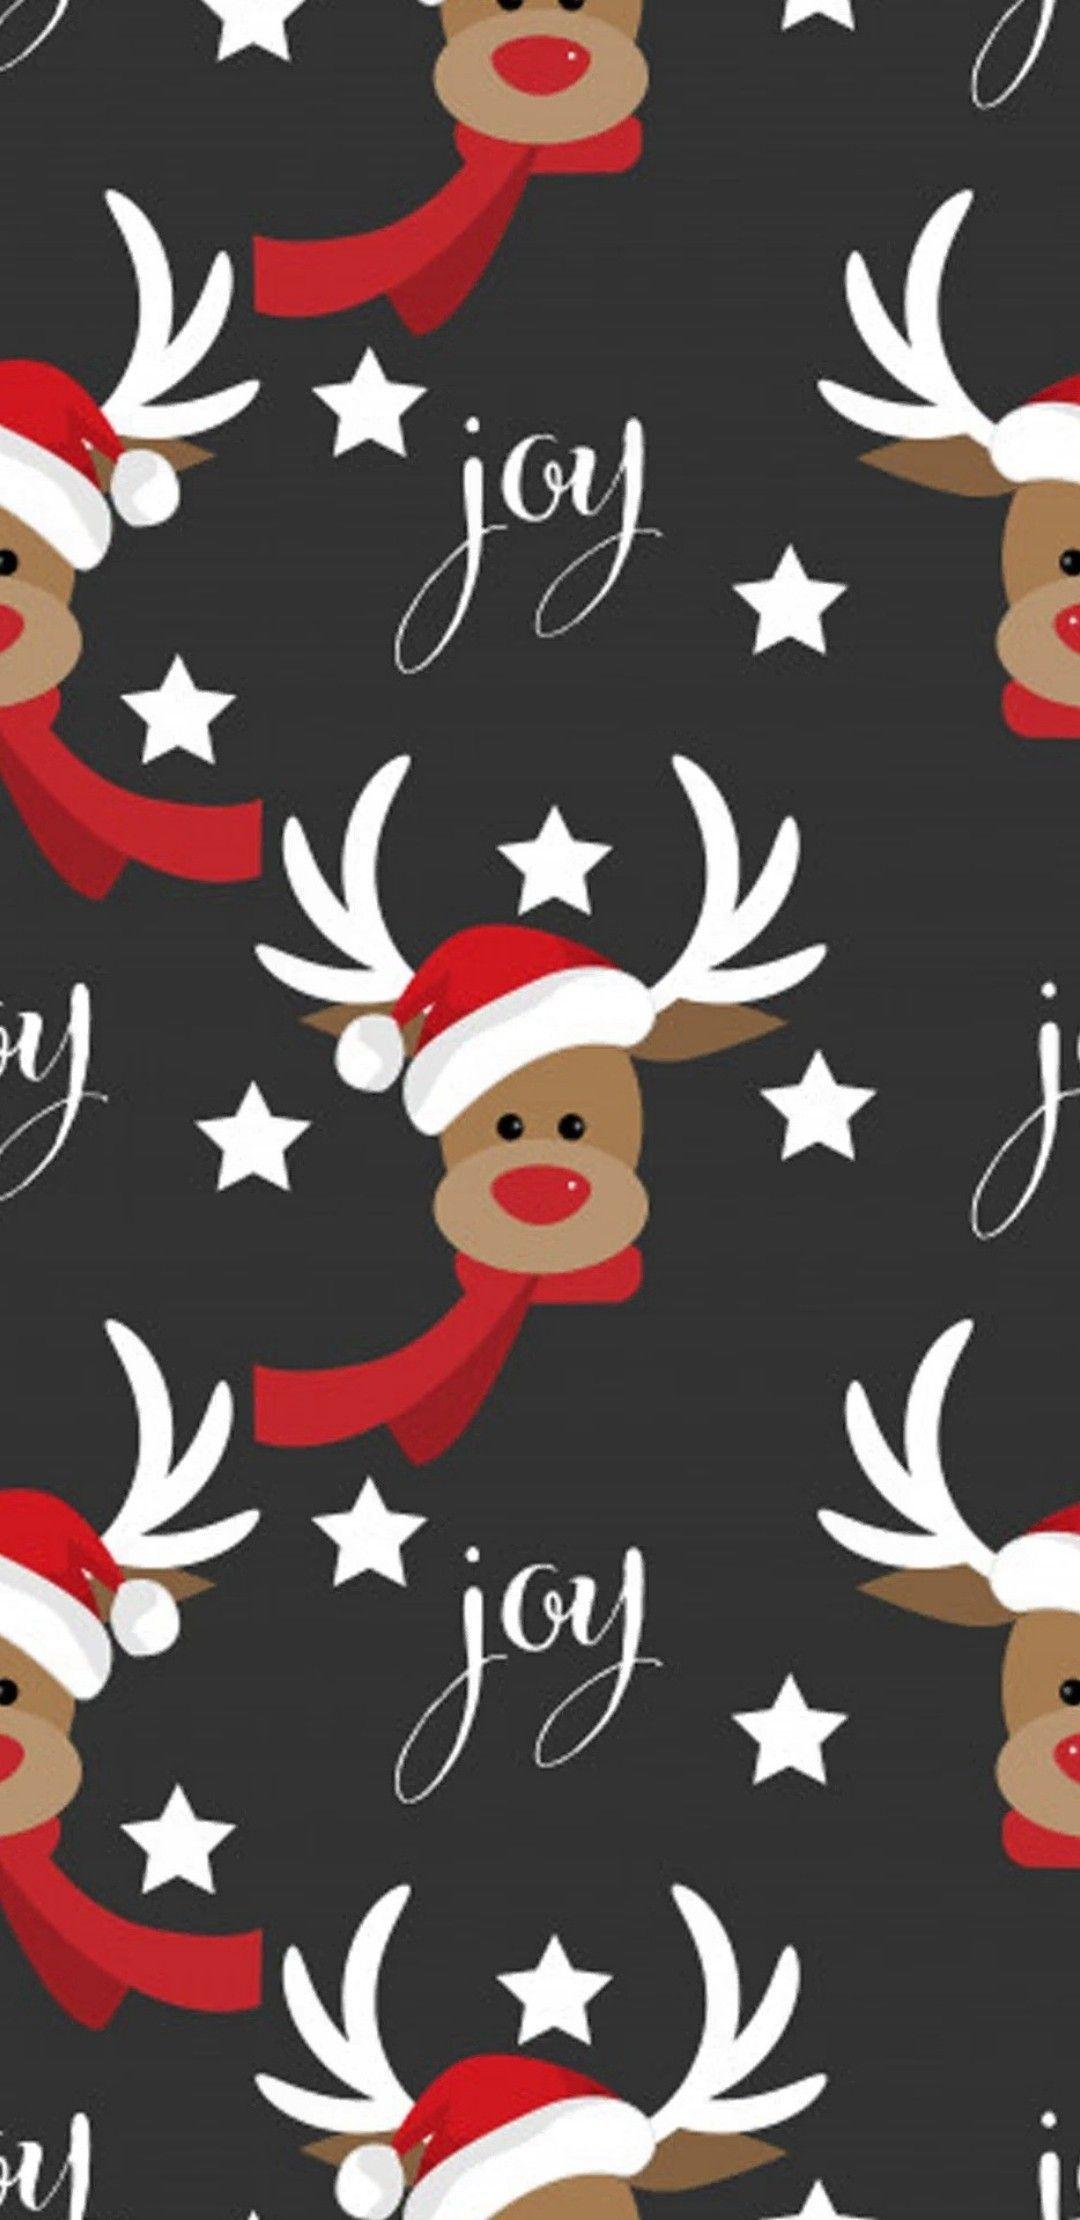 Pin by Dany on Christmas Wallpaper 2 Christmas wallpaper